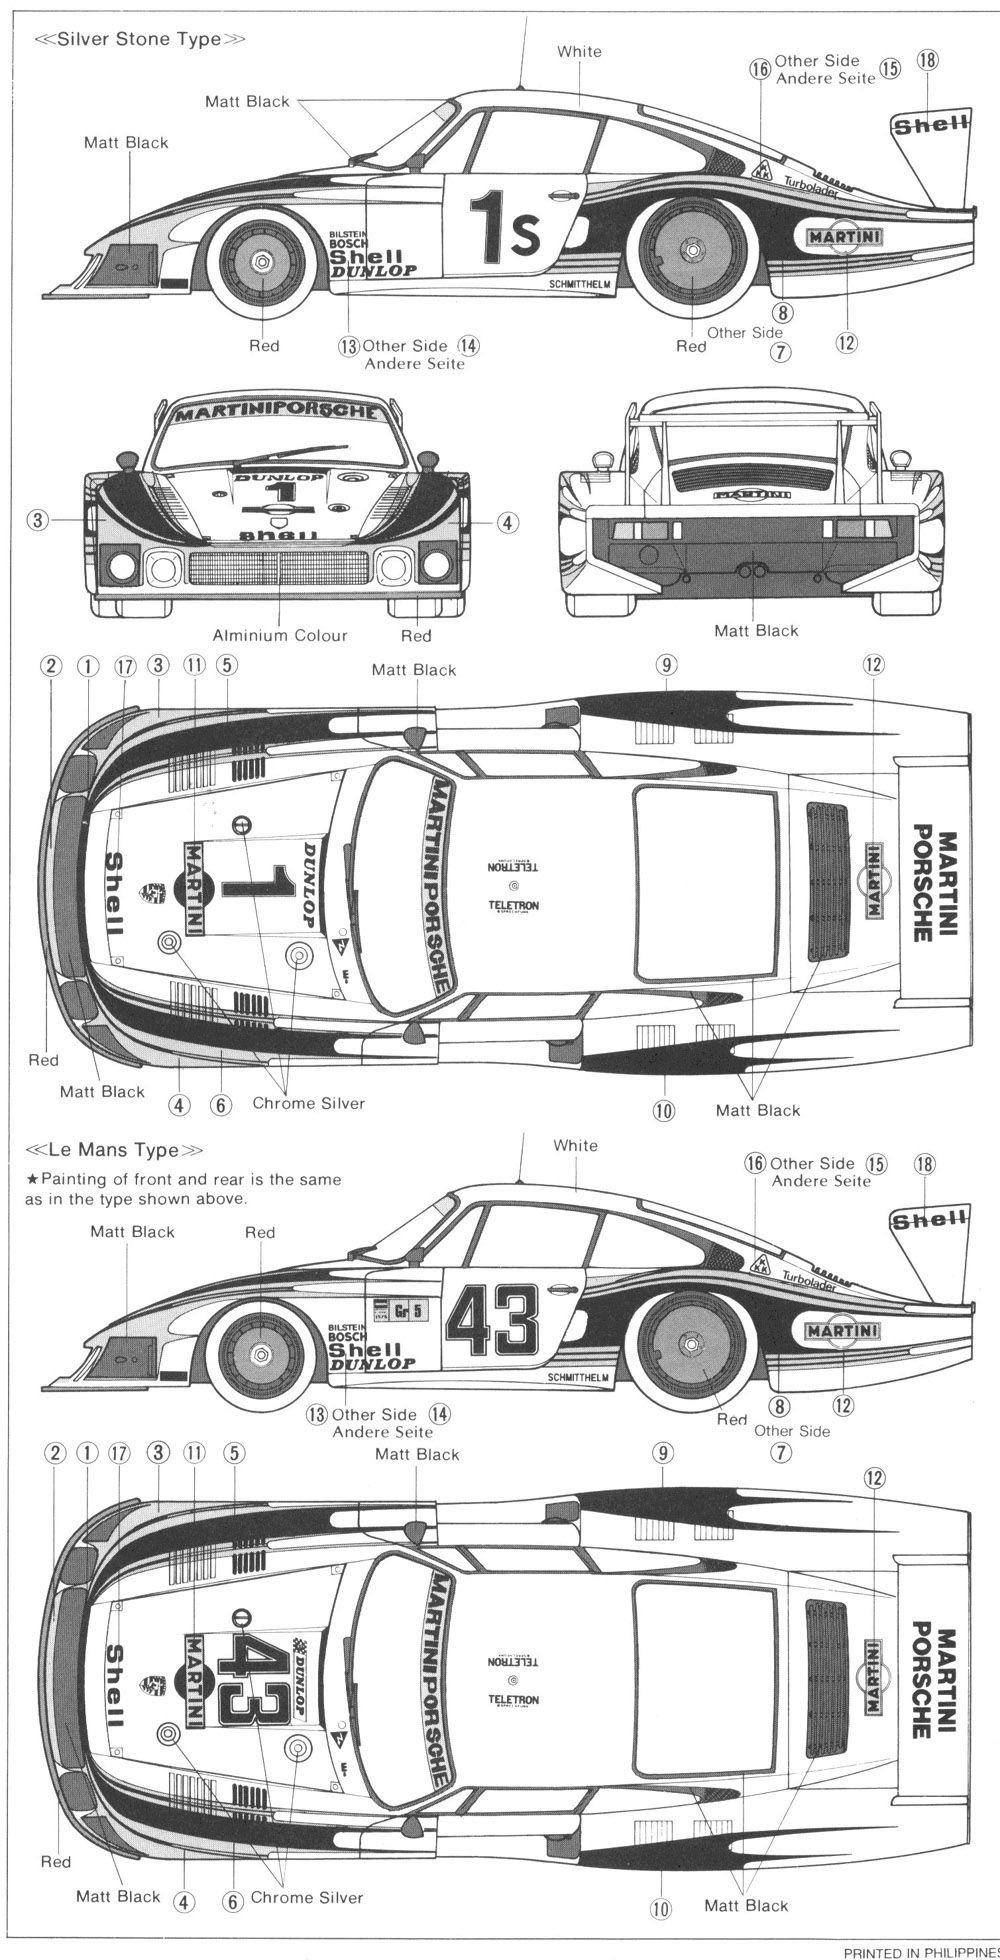 Porsche For Sale In Pelican Parts also Porsche 928 Throttle Body in addition Porsche Sticker additionally 121667627408206851 further Andy. on porsche 911 outlaw